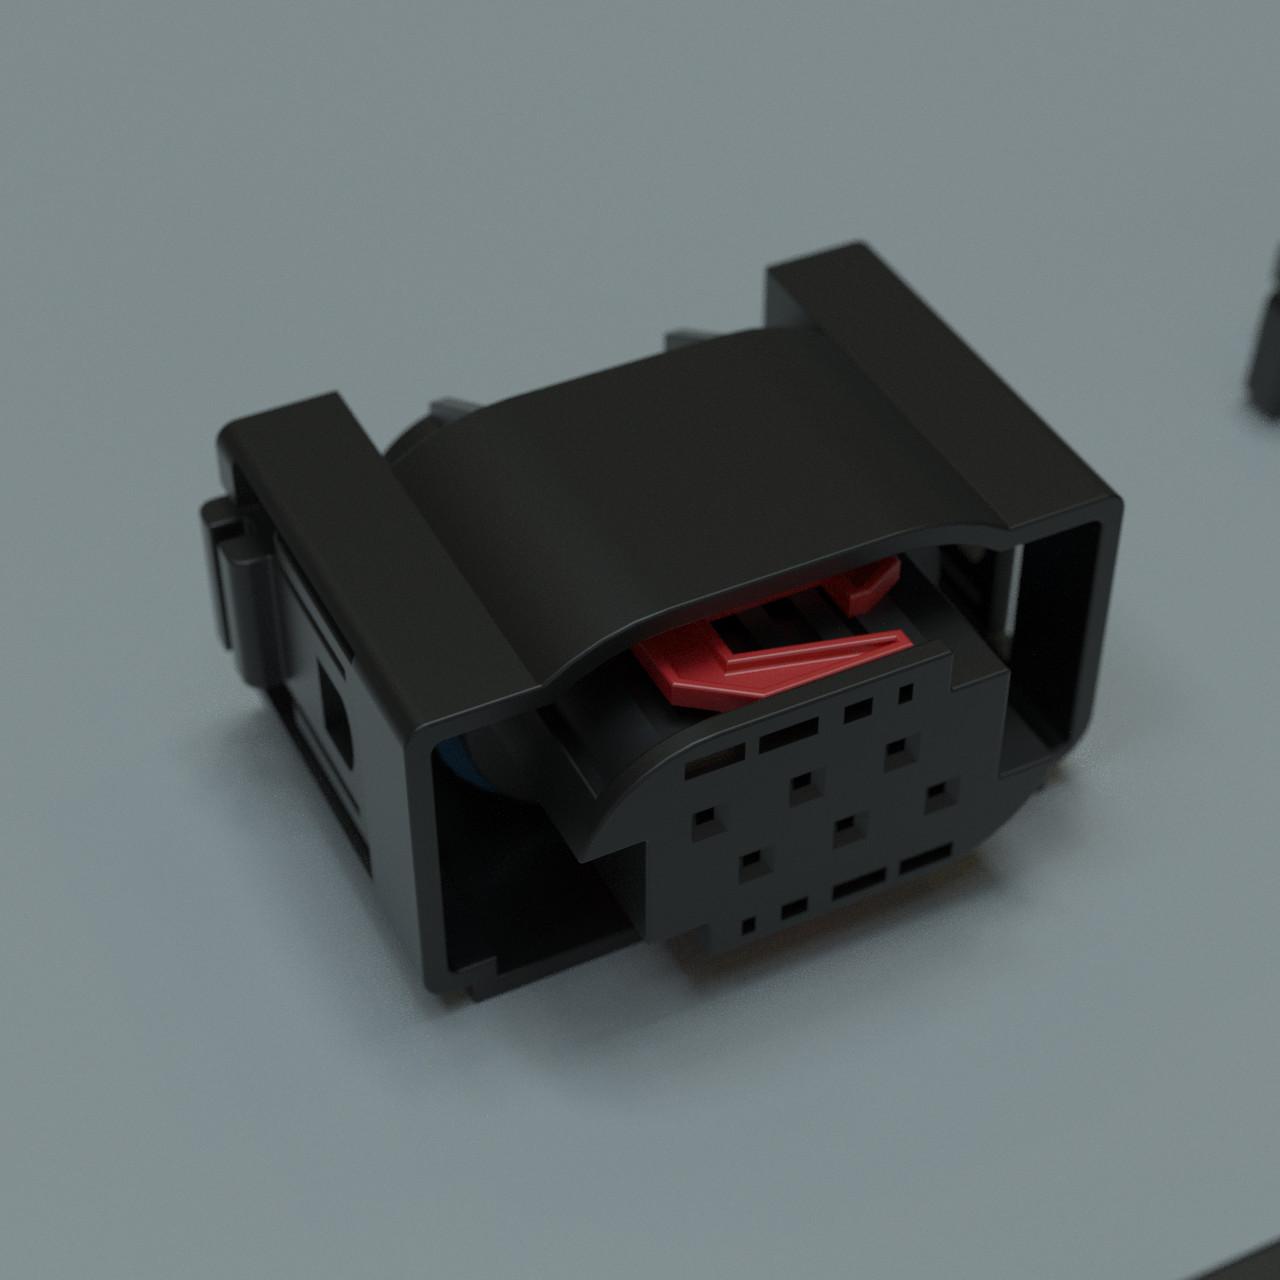 Cem tezcan wip11